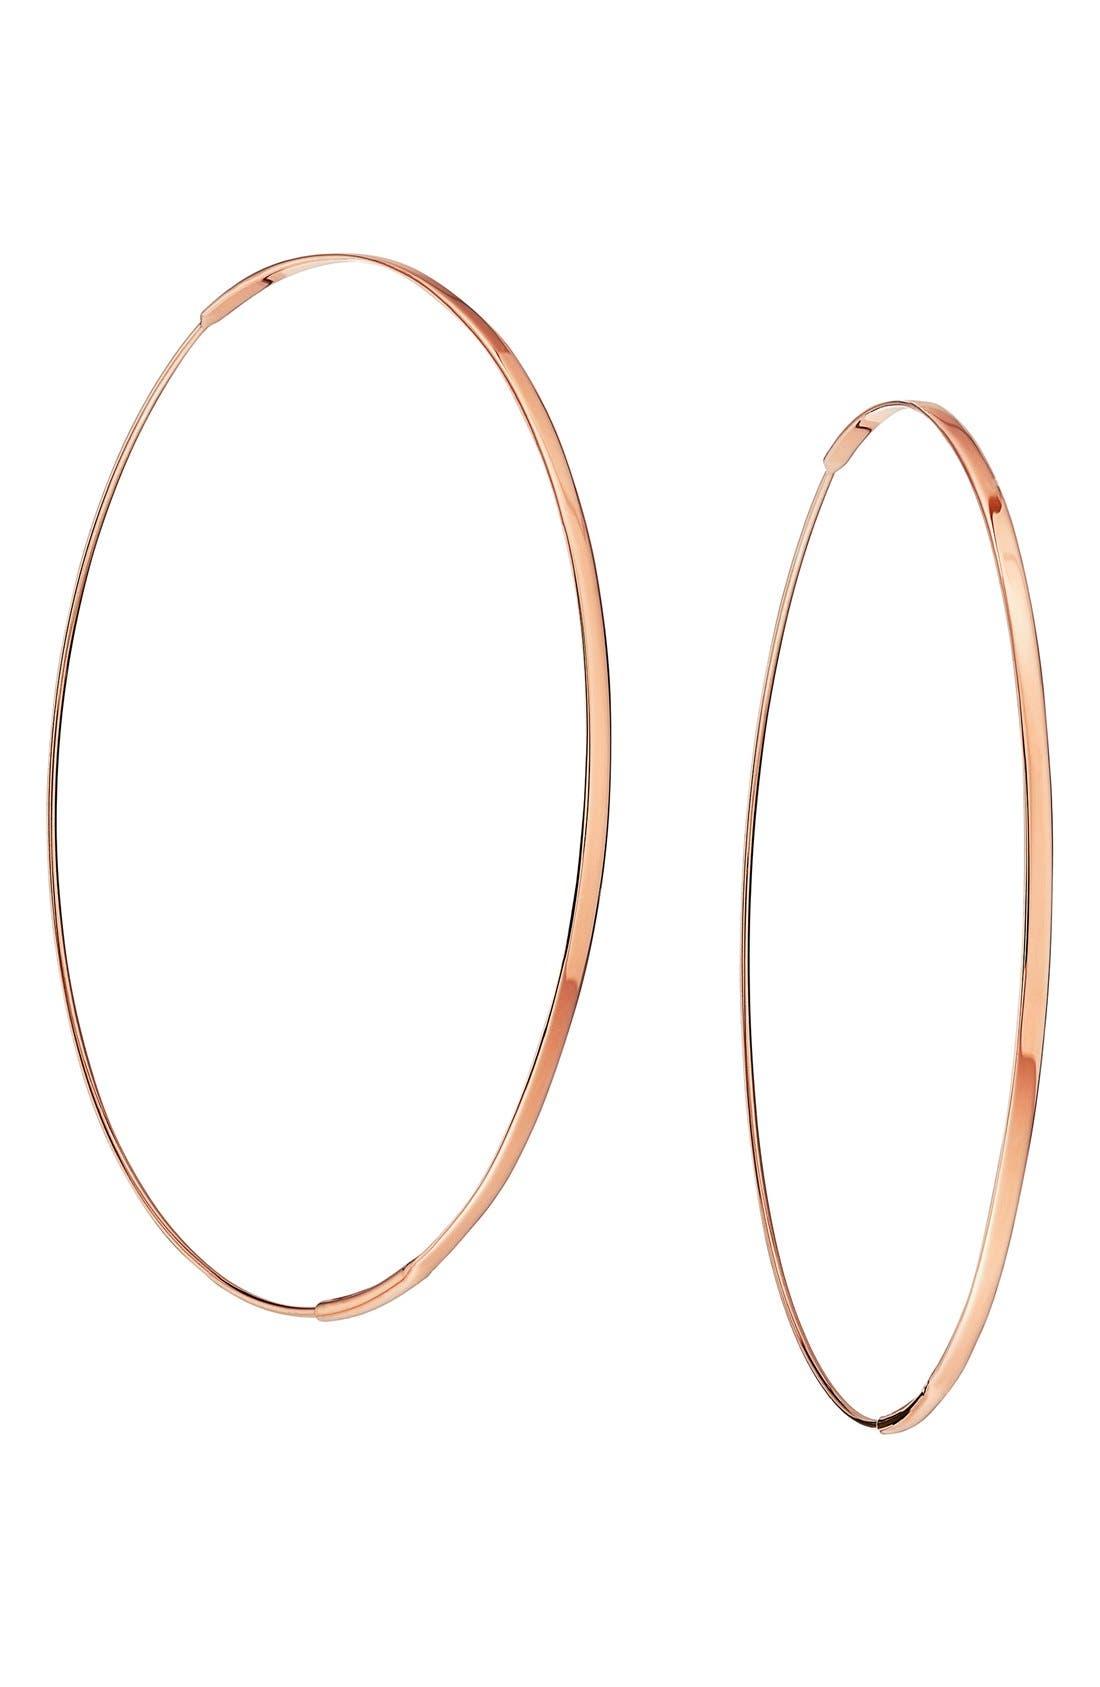 Lana Jewelry 'Large Flat Magic' Hoop Earrings